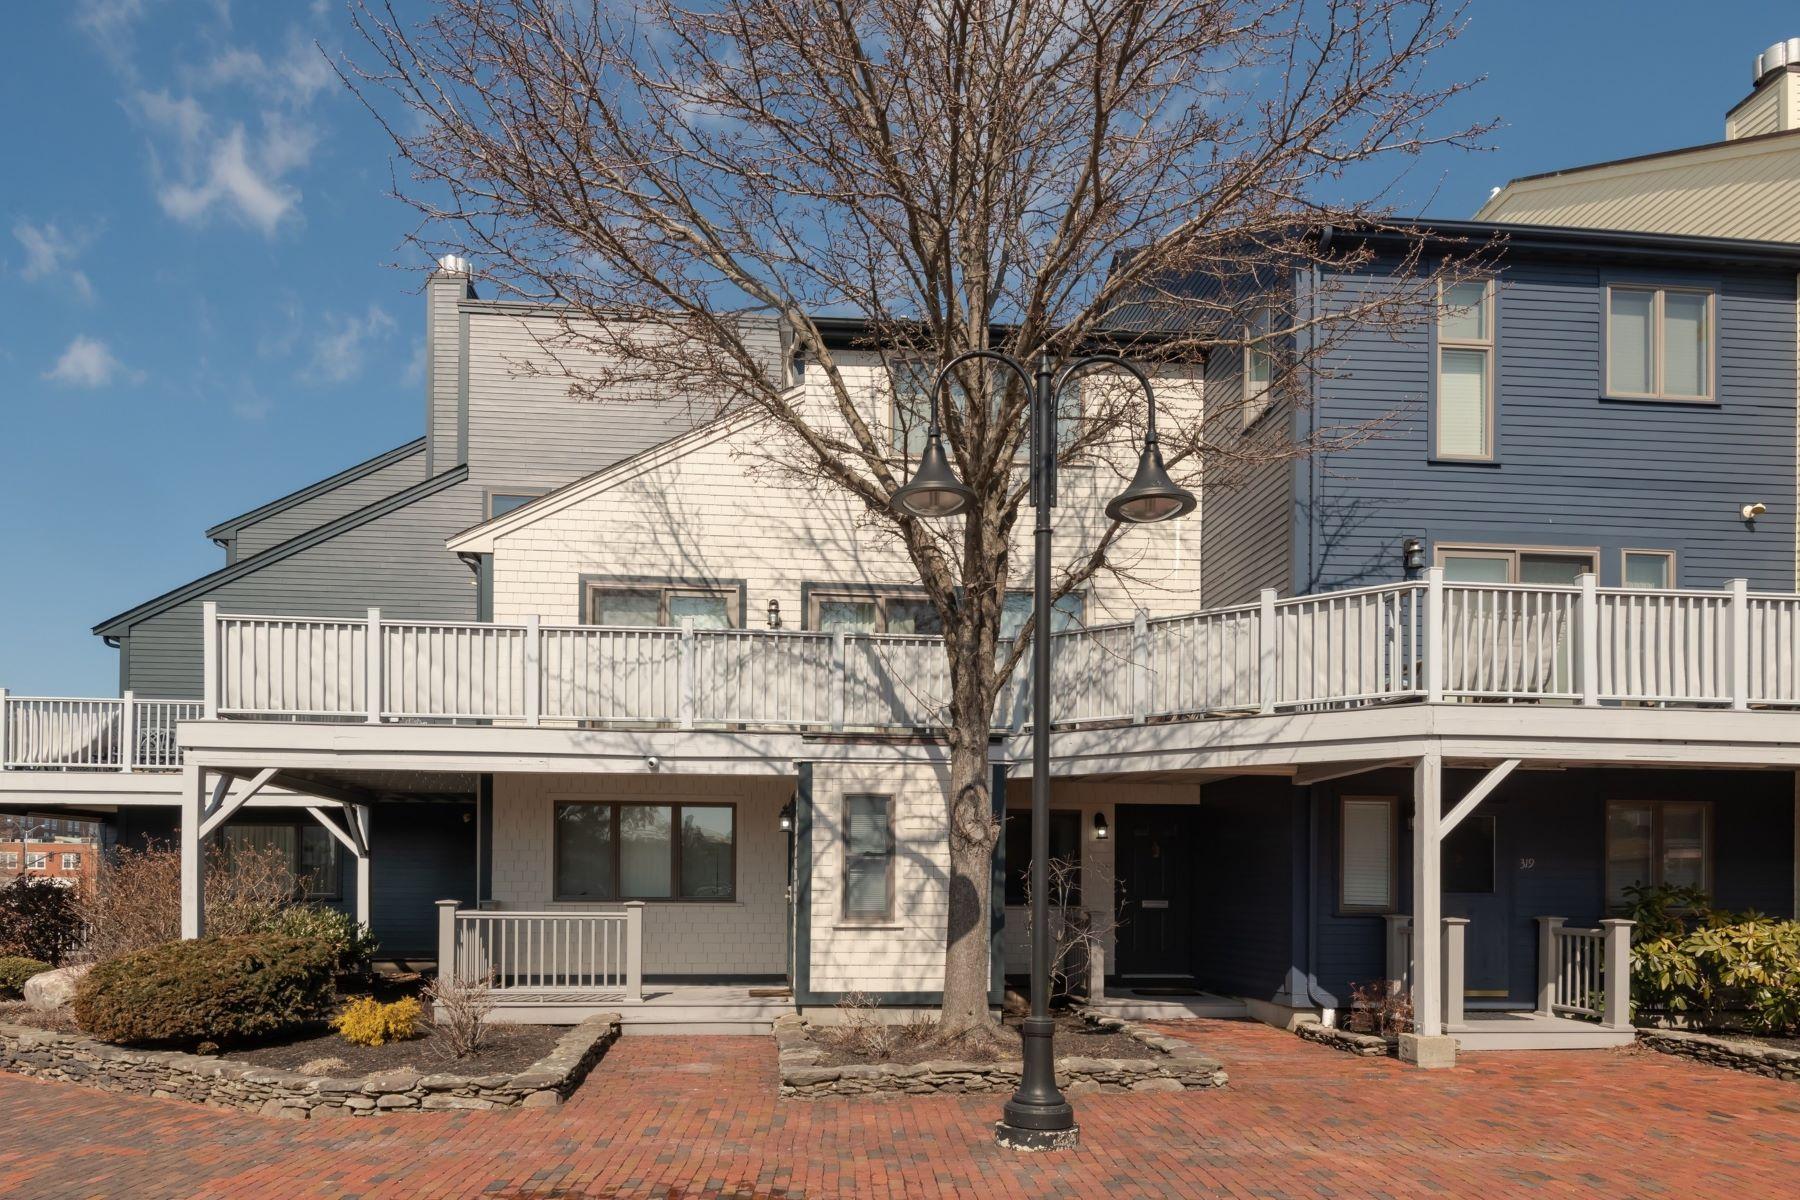 Condominiums for Sale at Brick Market Corner Townhouse 317 Swans Wharf Row Newport, Rhode Island 02840 United States